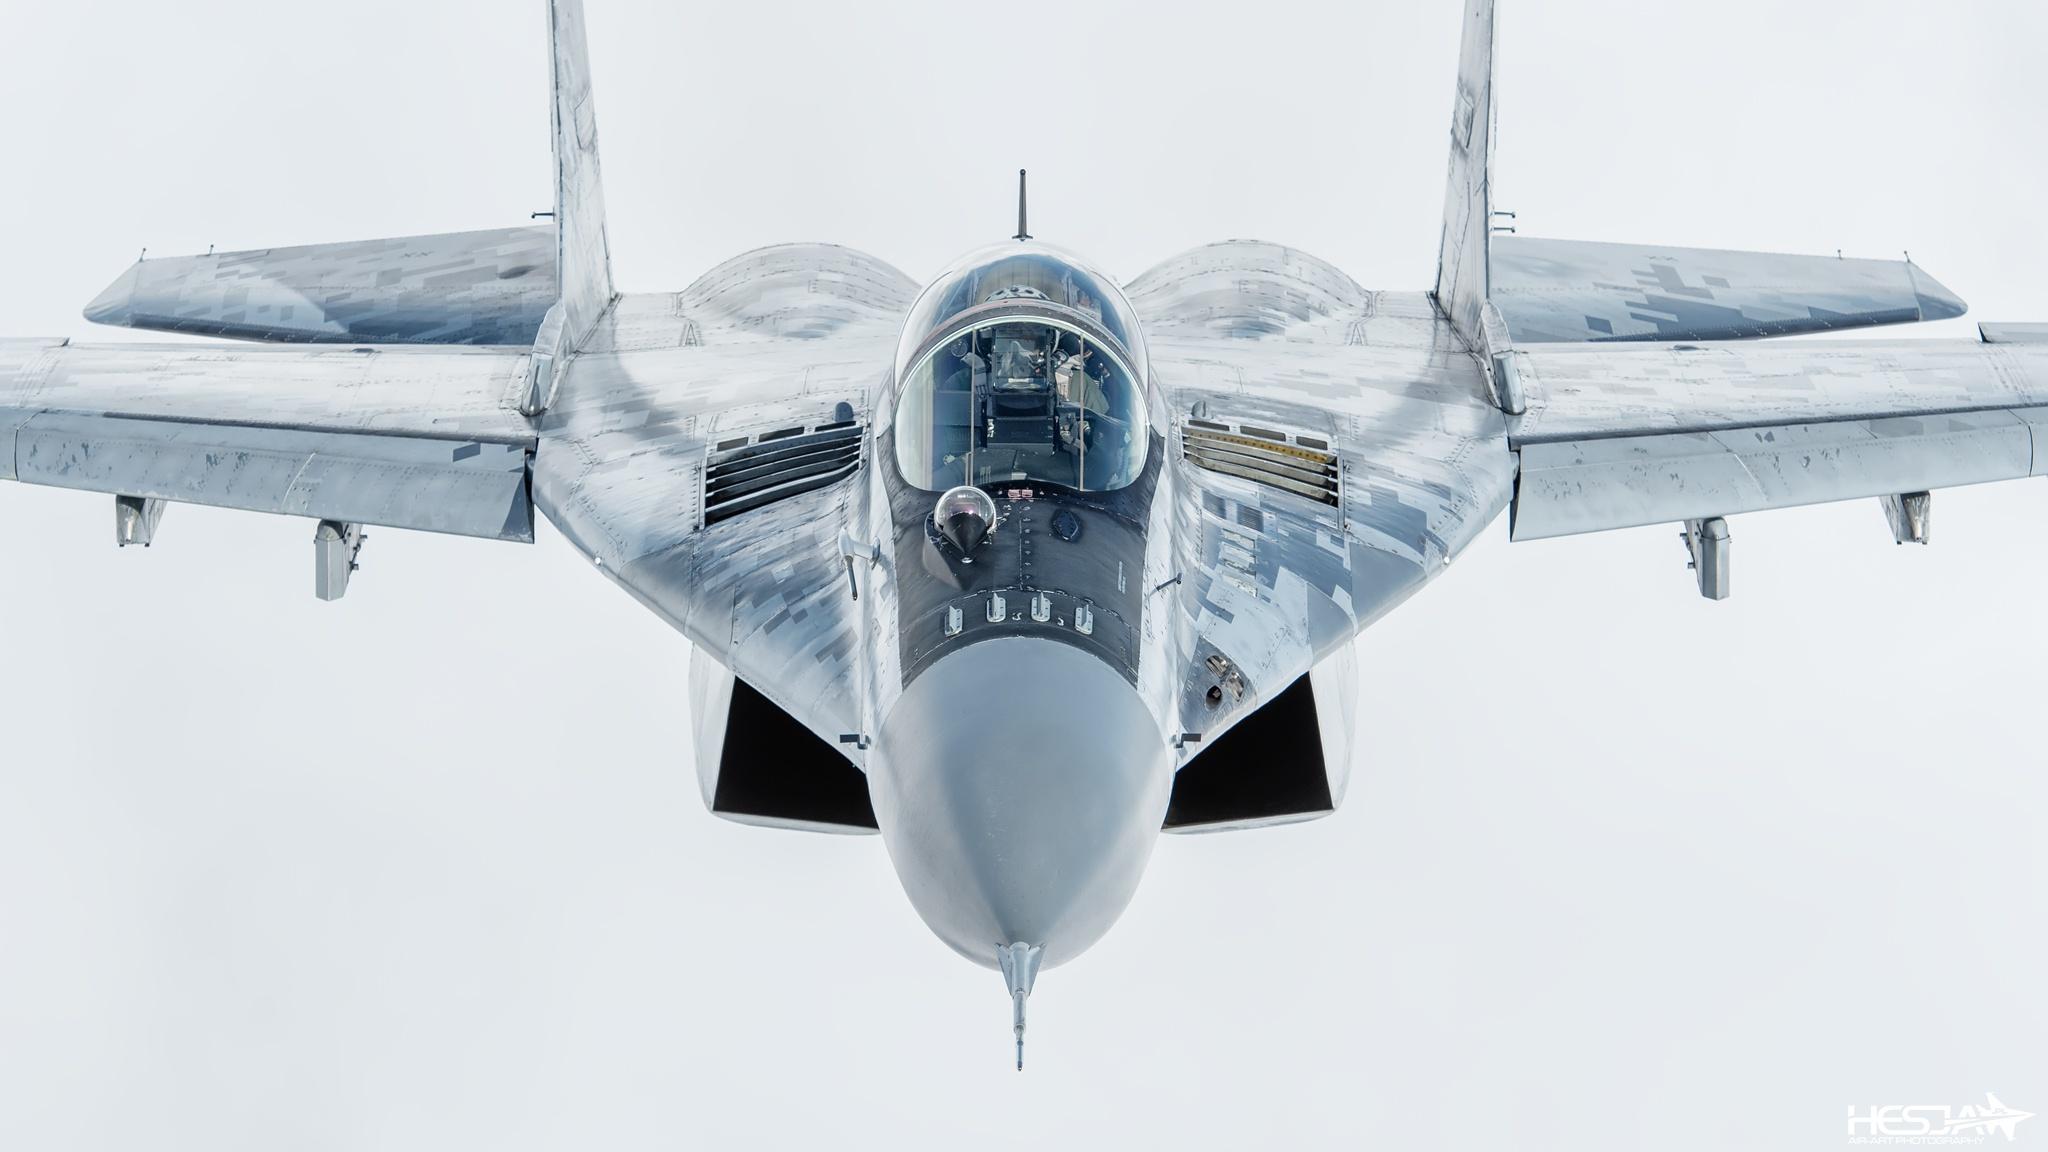 General 2048x1152 vehicle aircraft military aircraft military mig-29